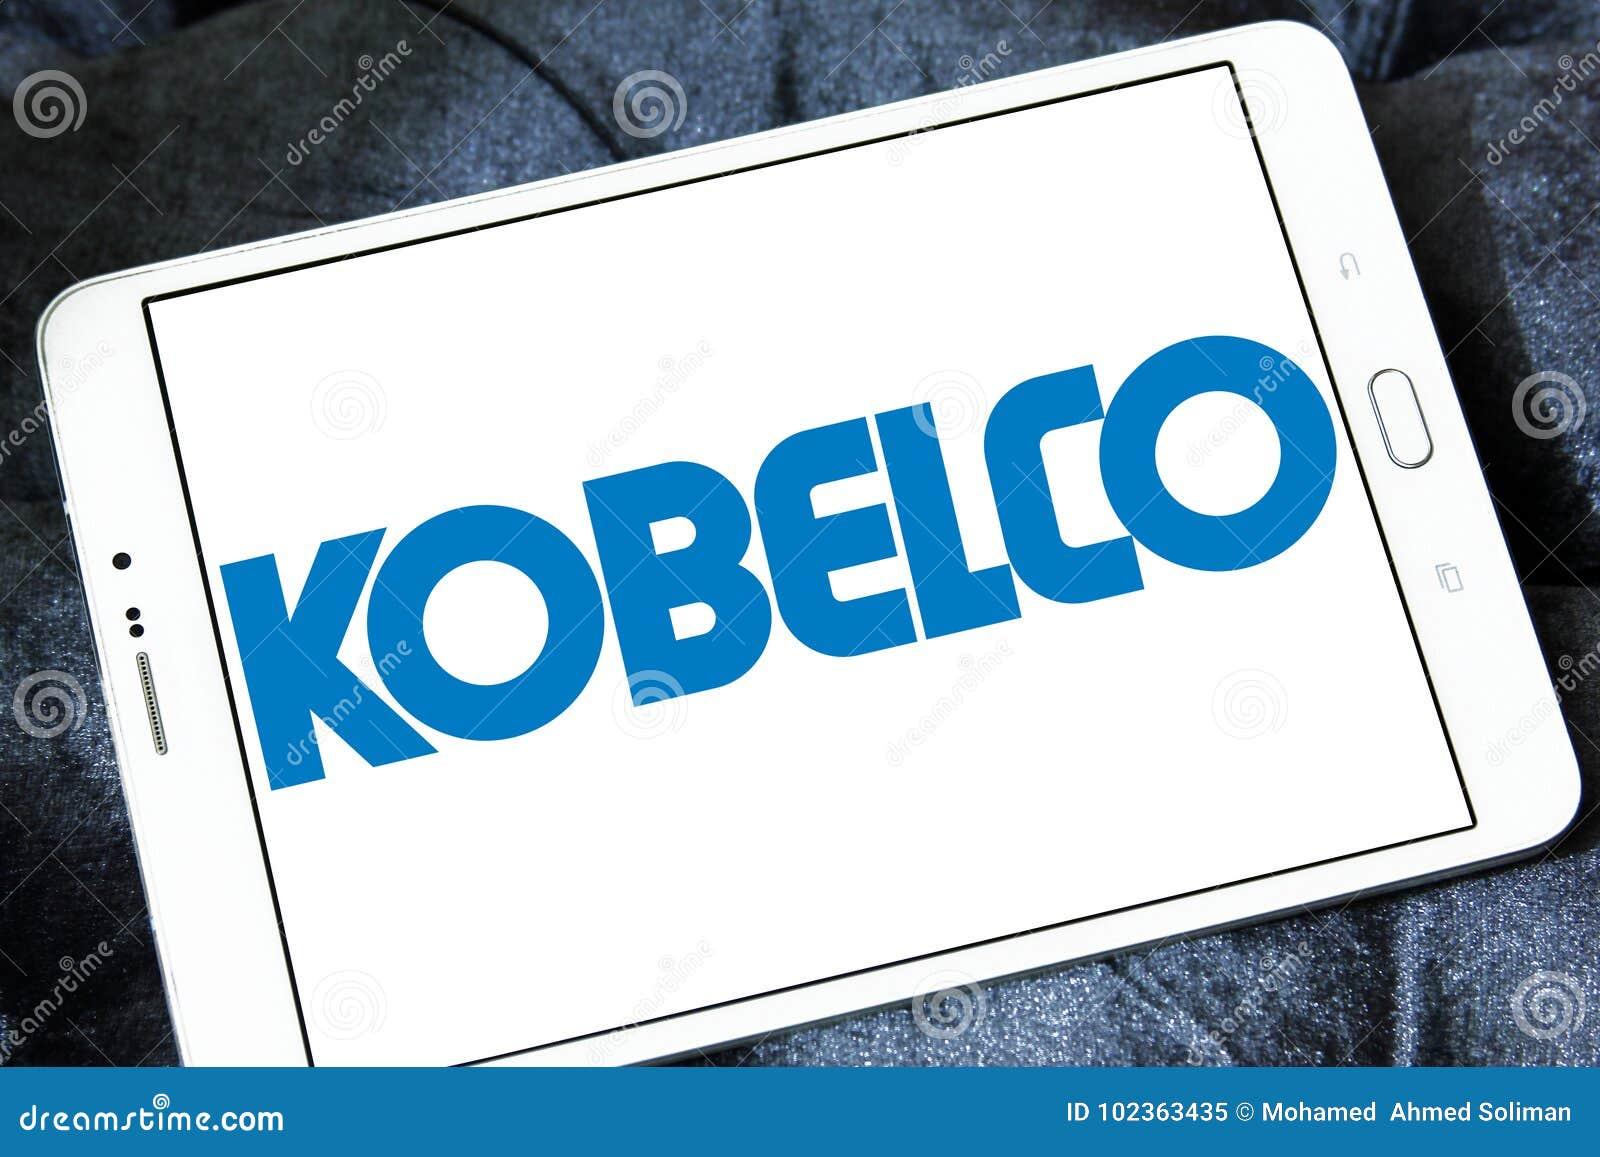 Kobelco steel company logo editorial image  Image of half - 102363435